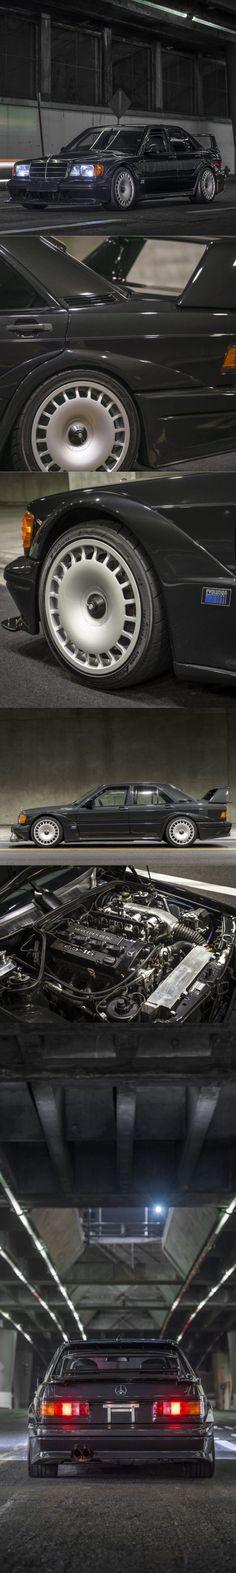 1990 Mercedes-Benz 190E Evo 2 / 502pcs / 235hp / Germany / black /… - https://www.luxury.guugles.com/1990-mercedes-benz-190e-evo-2-502pcs-235hp-germany-black/